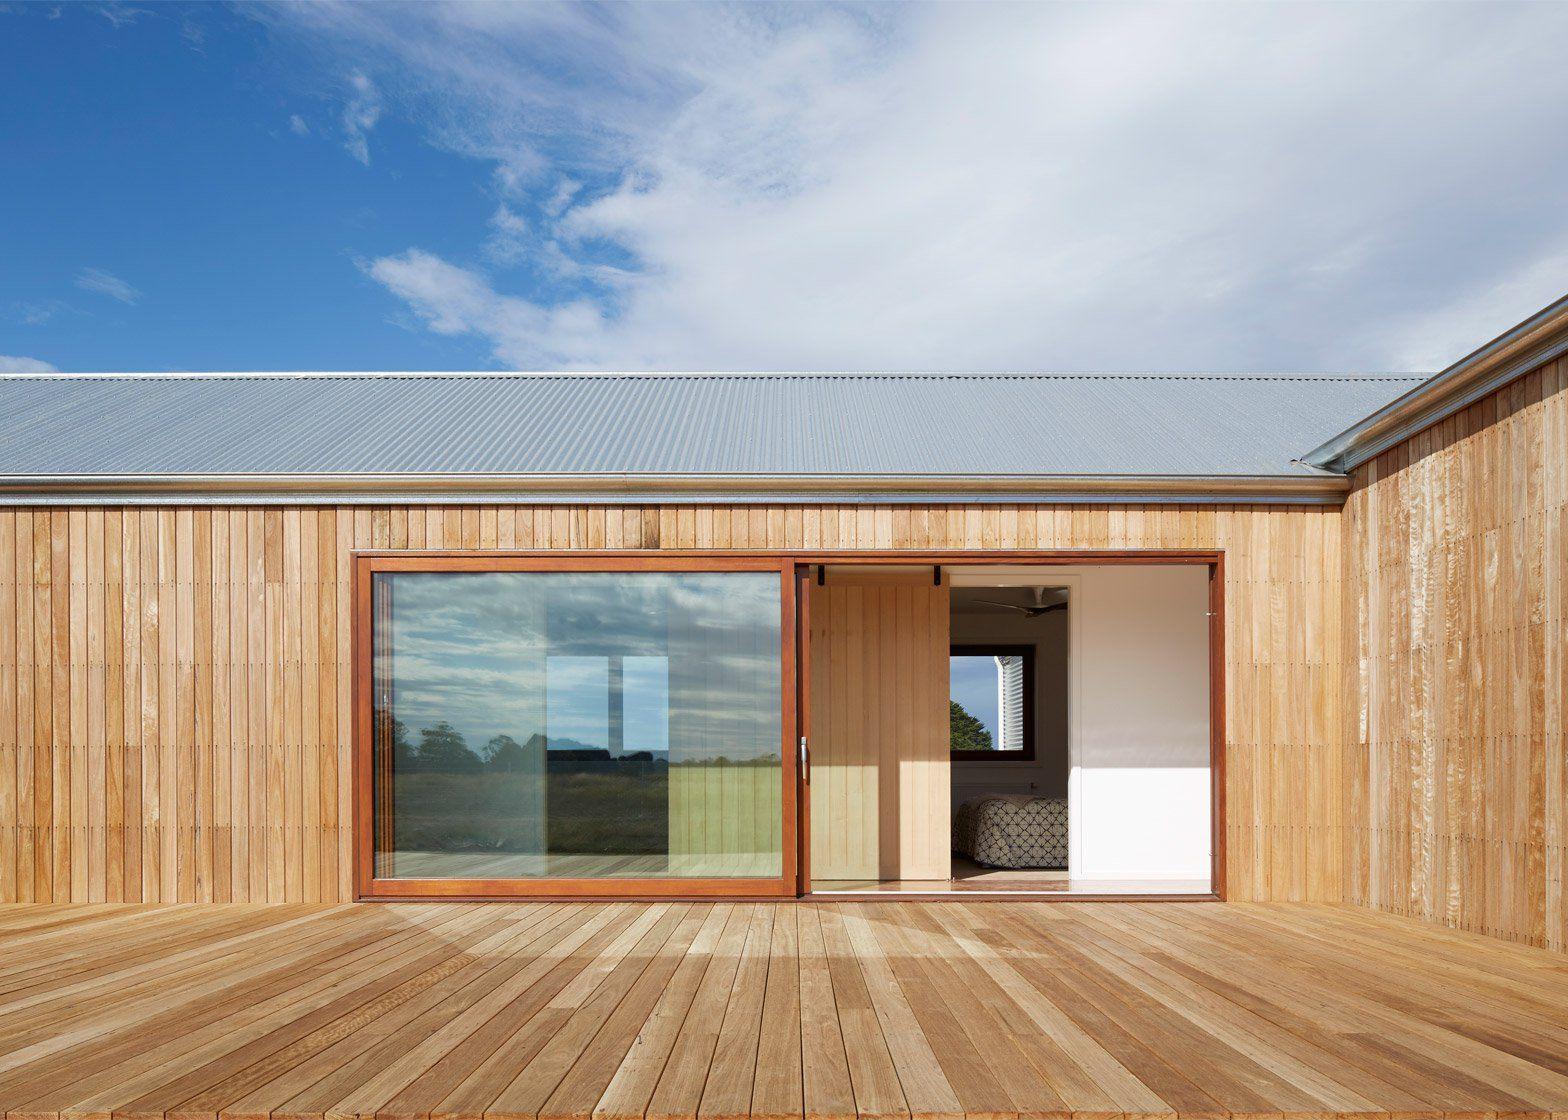 700 Haus by Glow Design Group | Loft Bedrooms | Pinterest | Haus ...